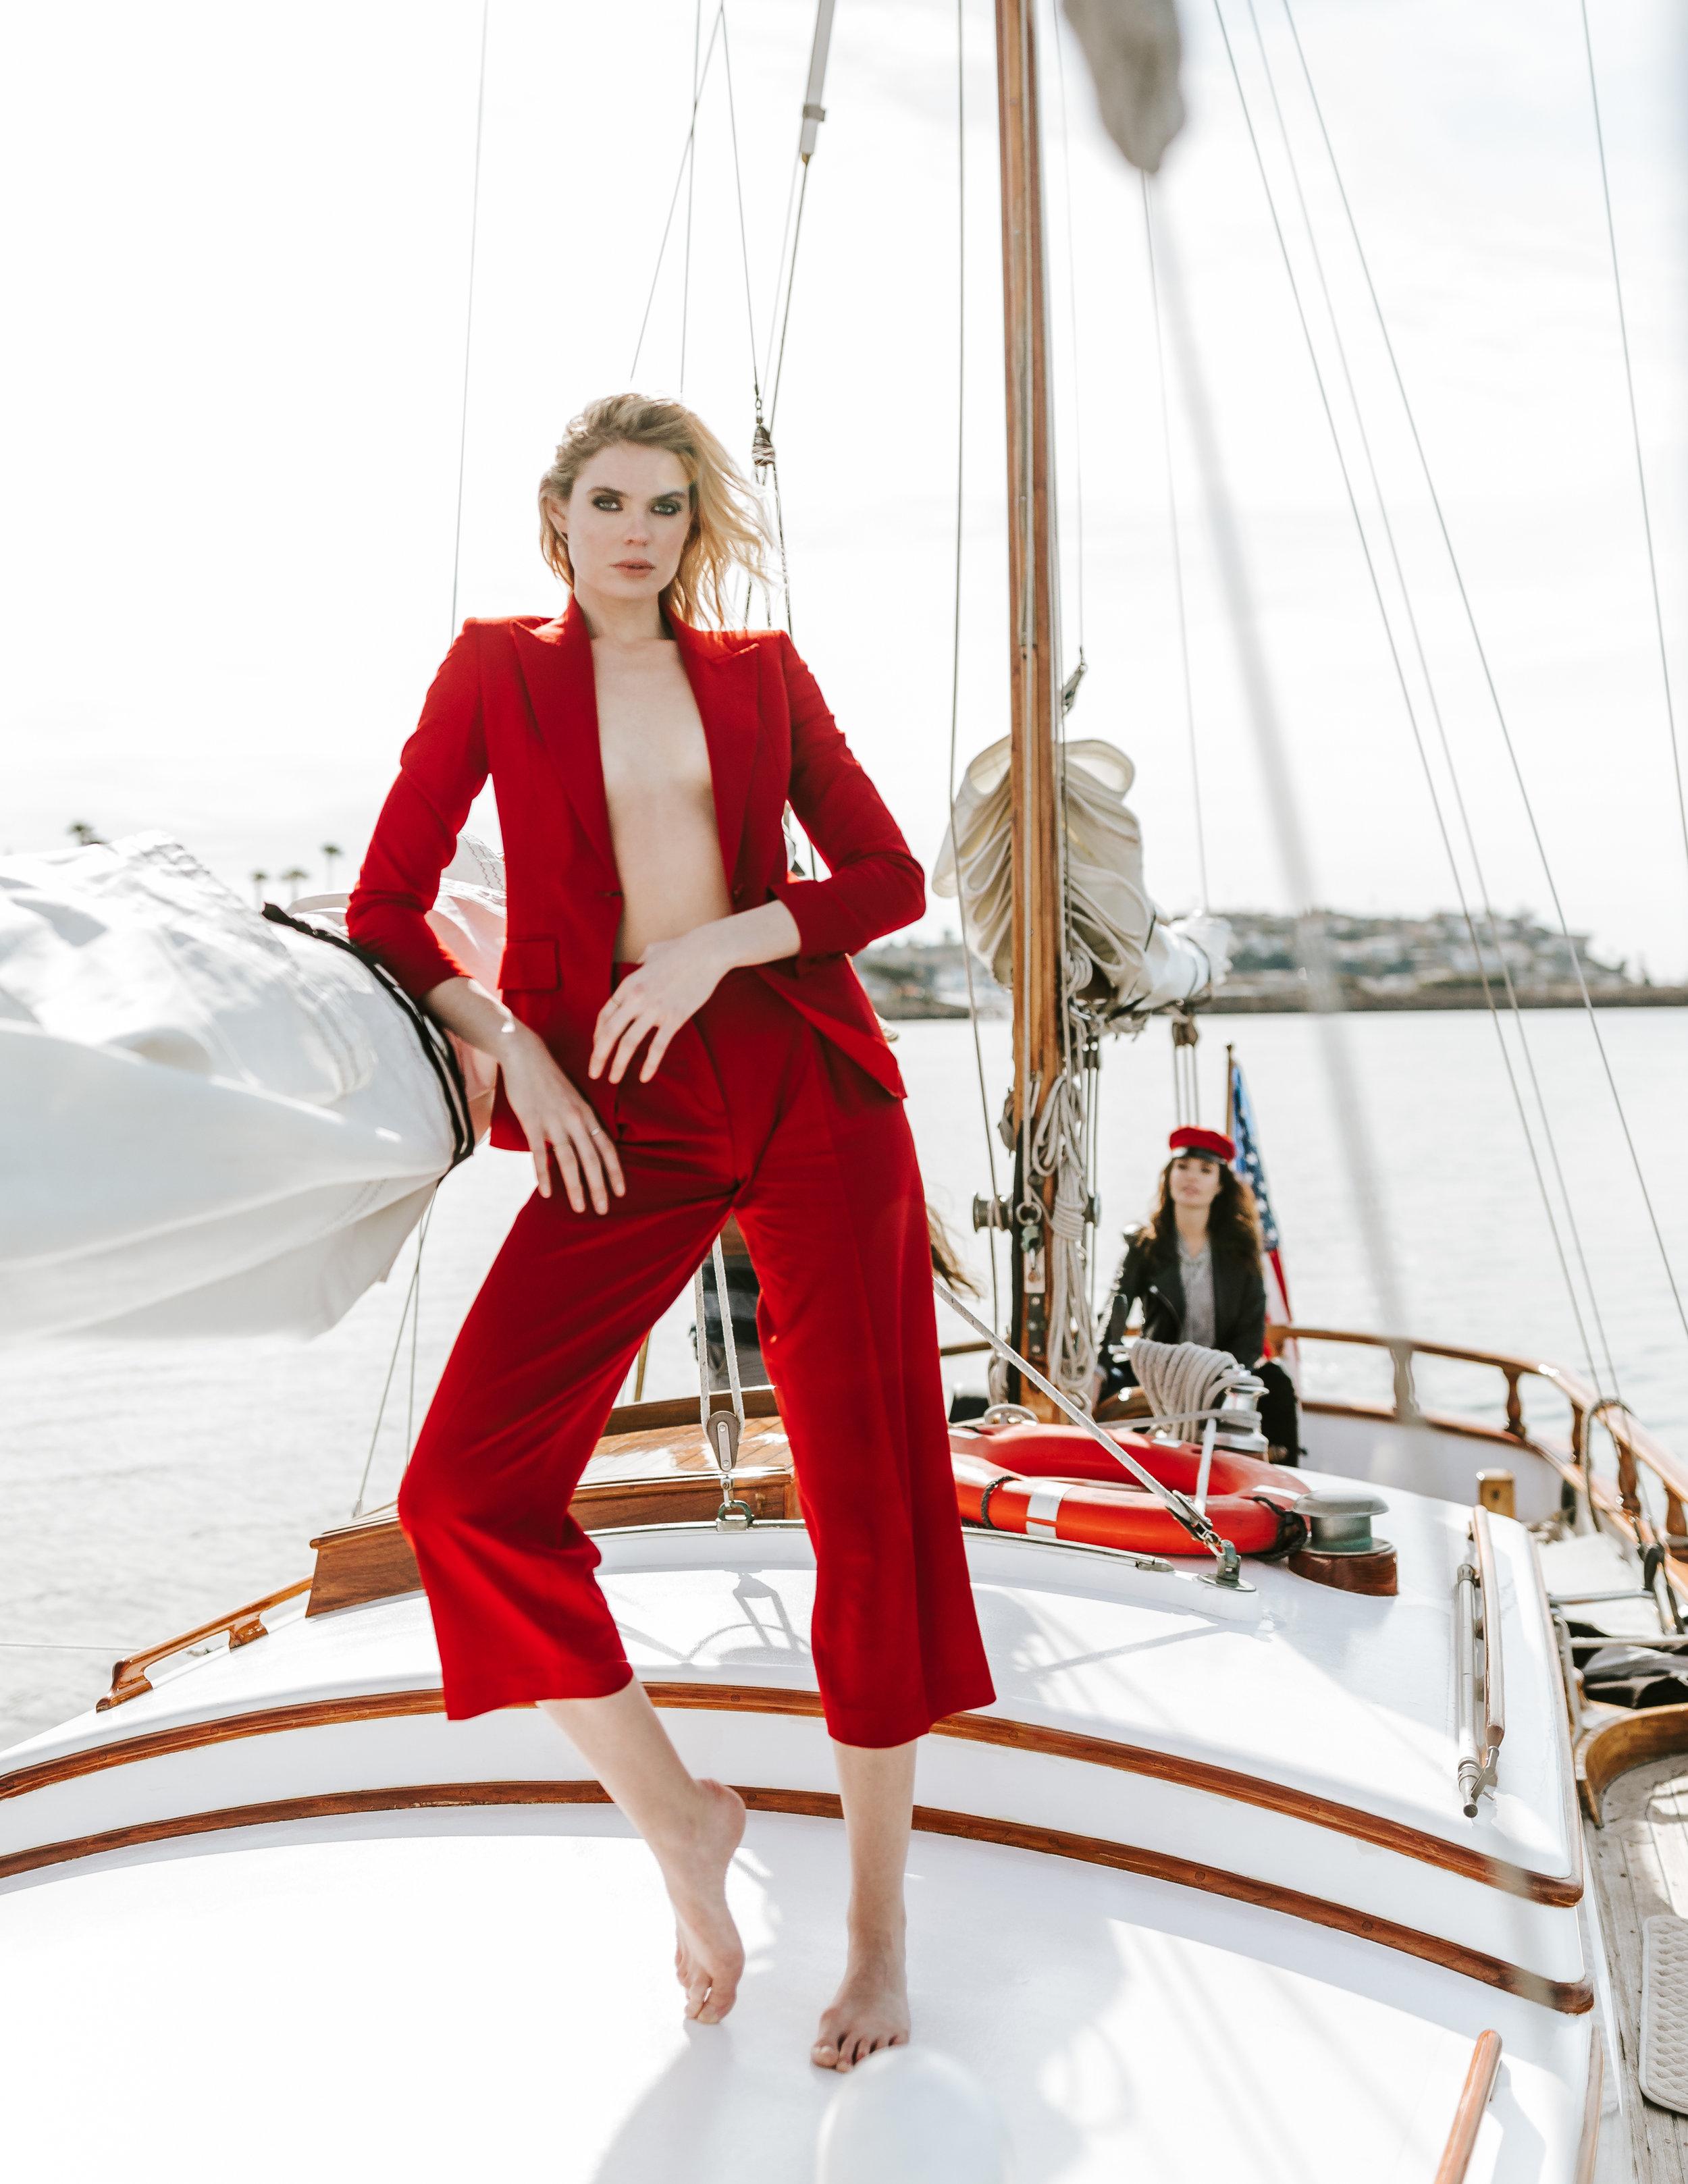 Sailing Editorials (31 of 36).jpg